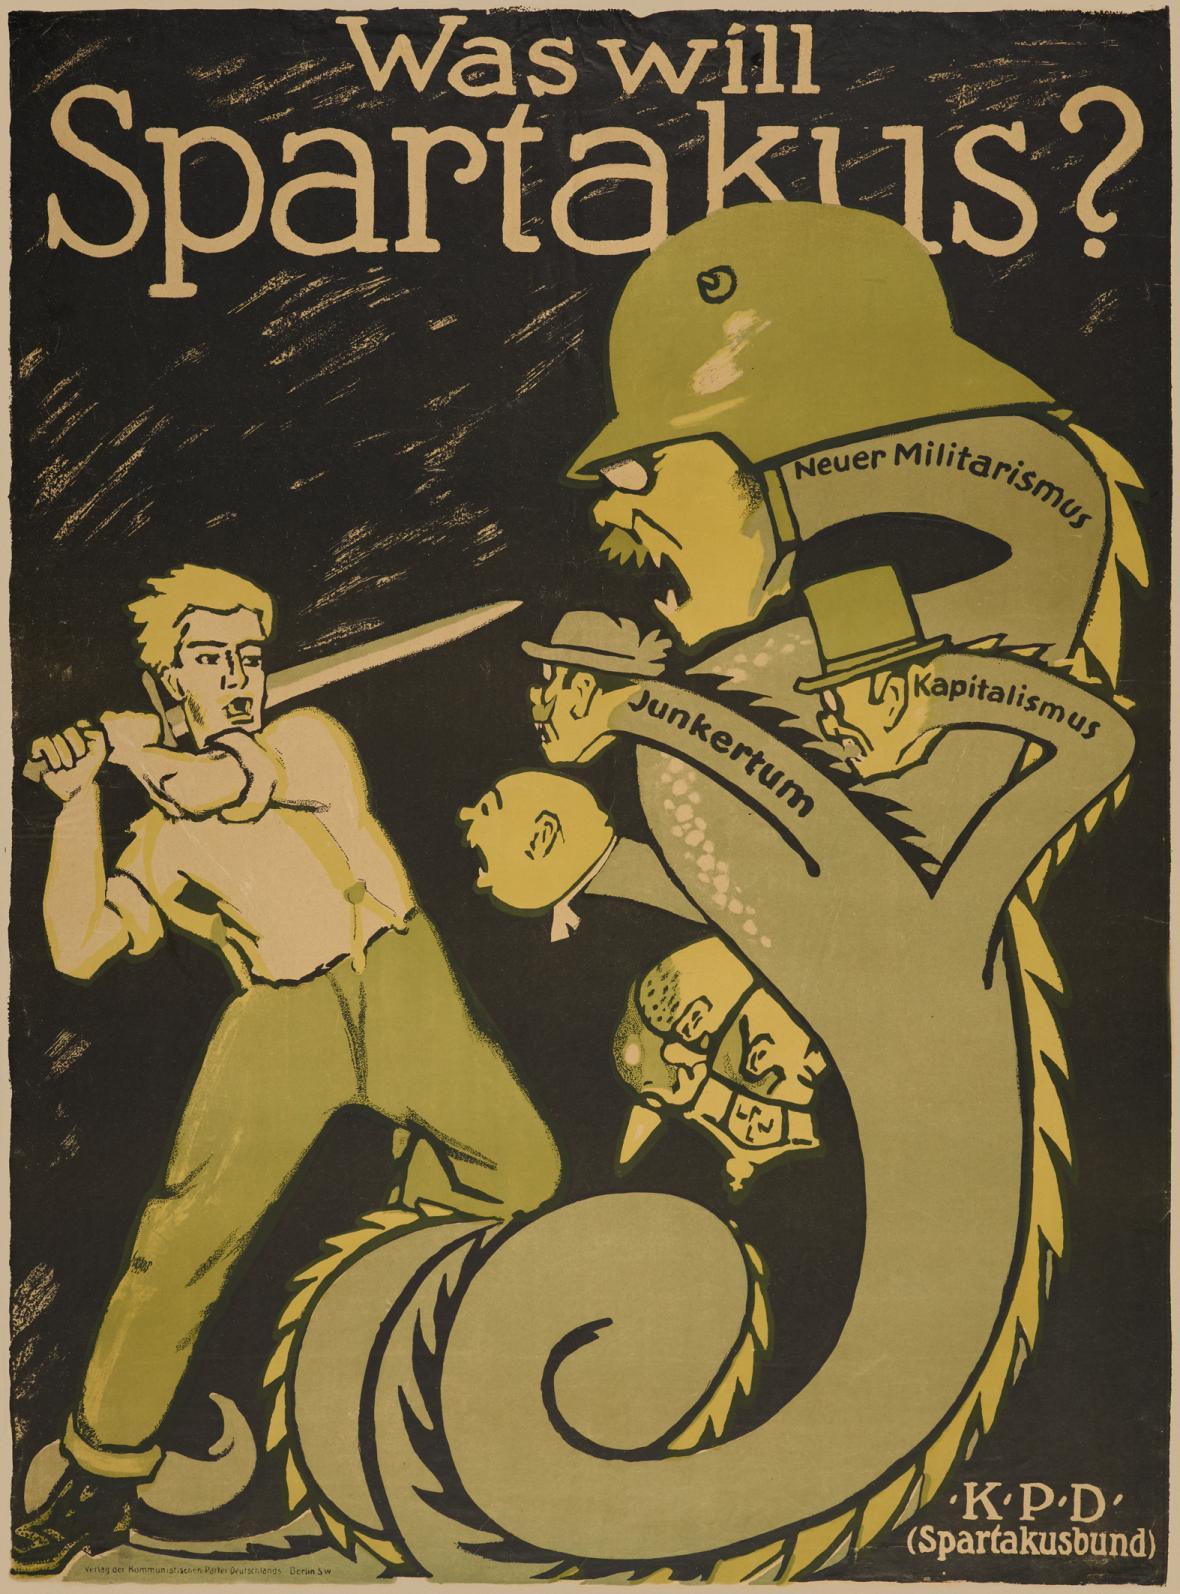 Co chce Spartakus?